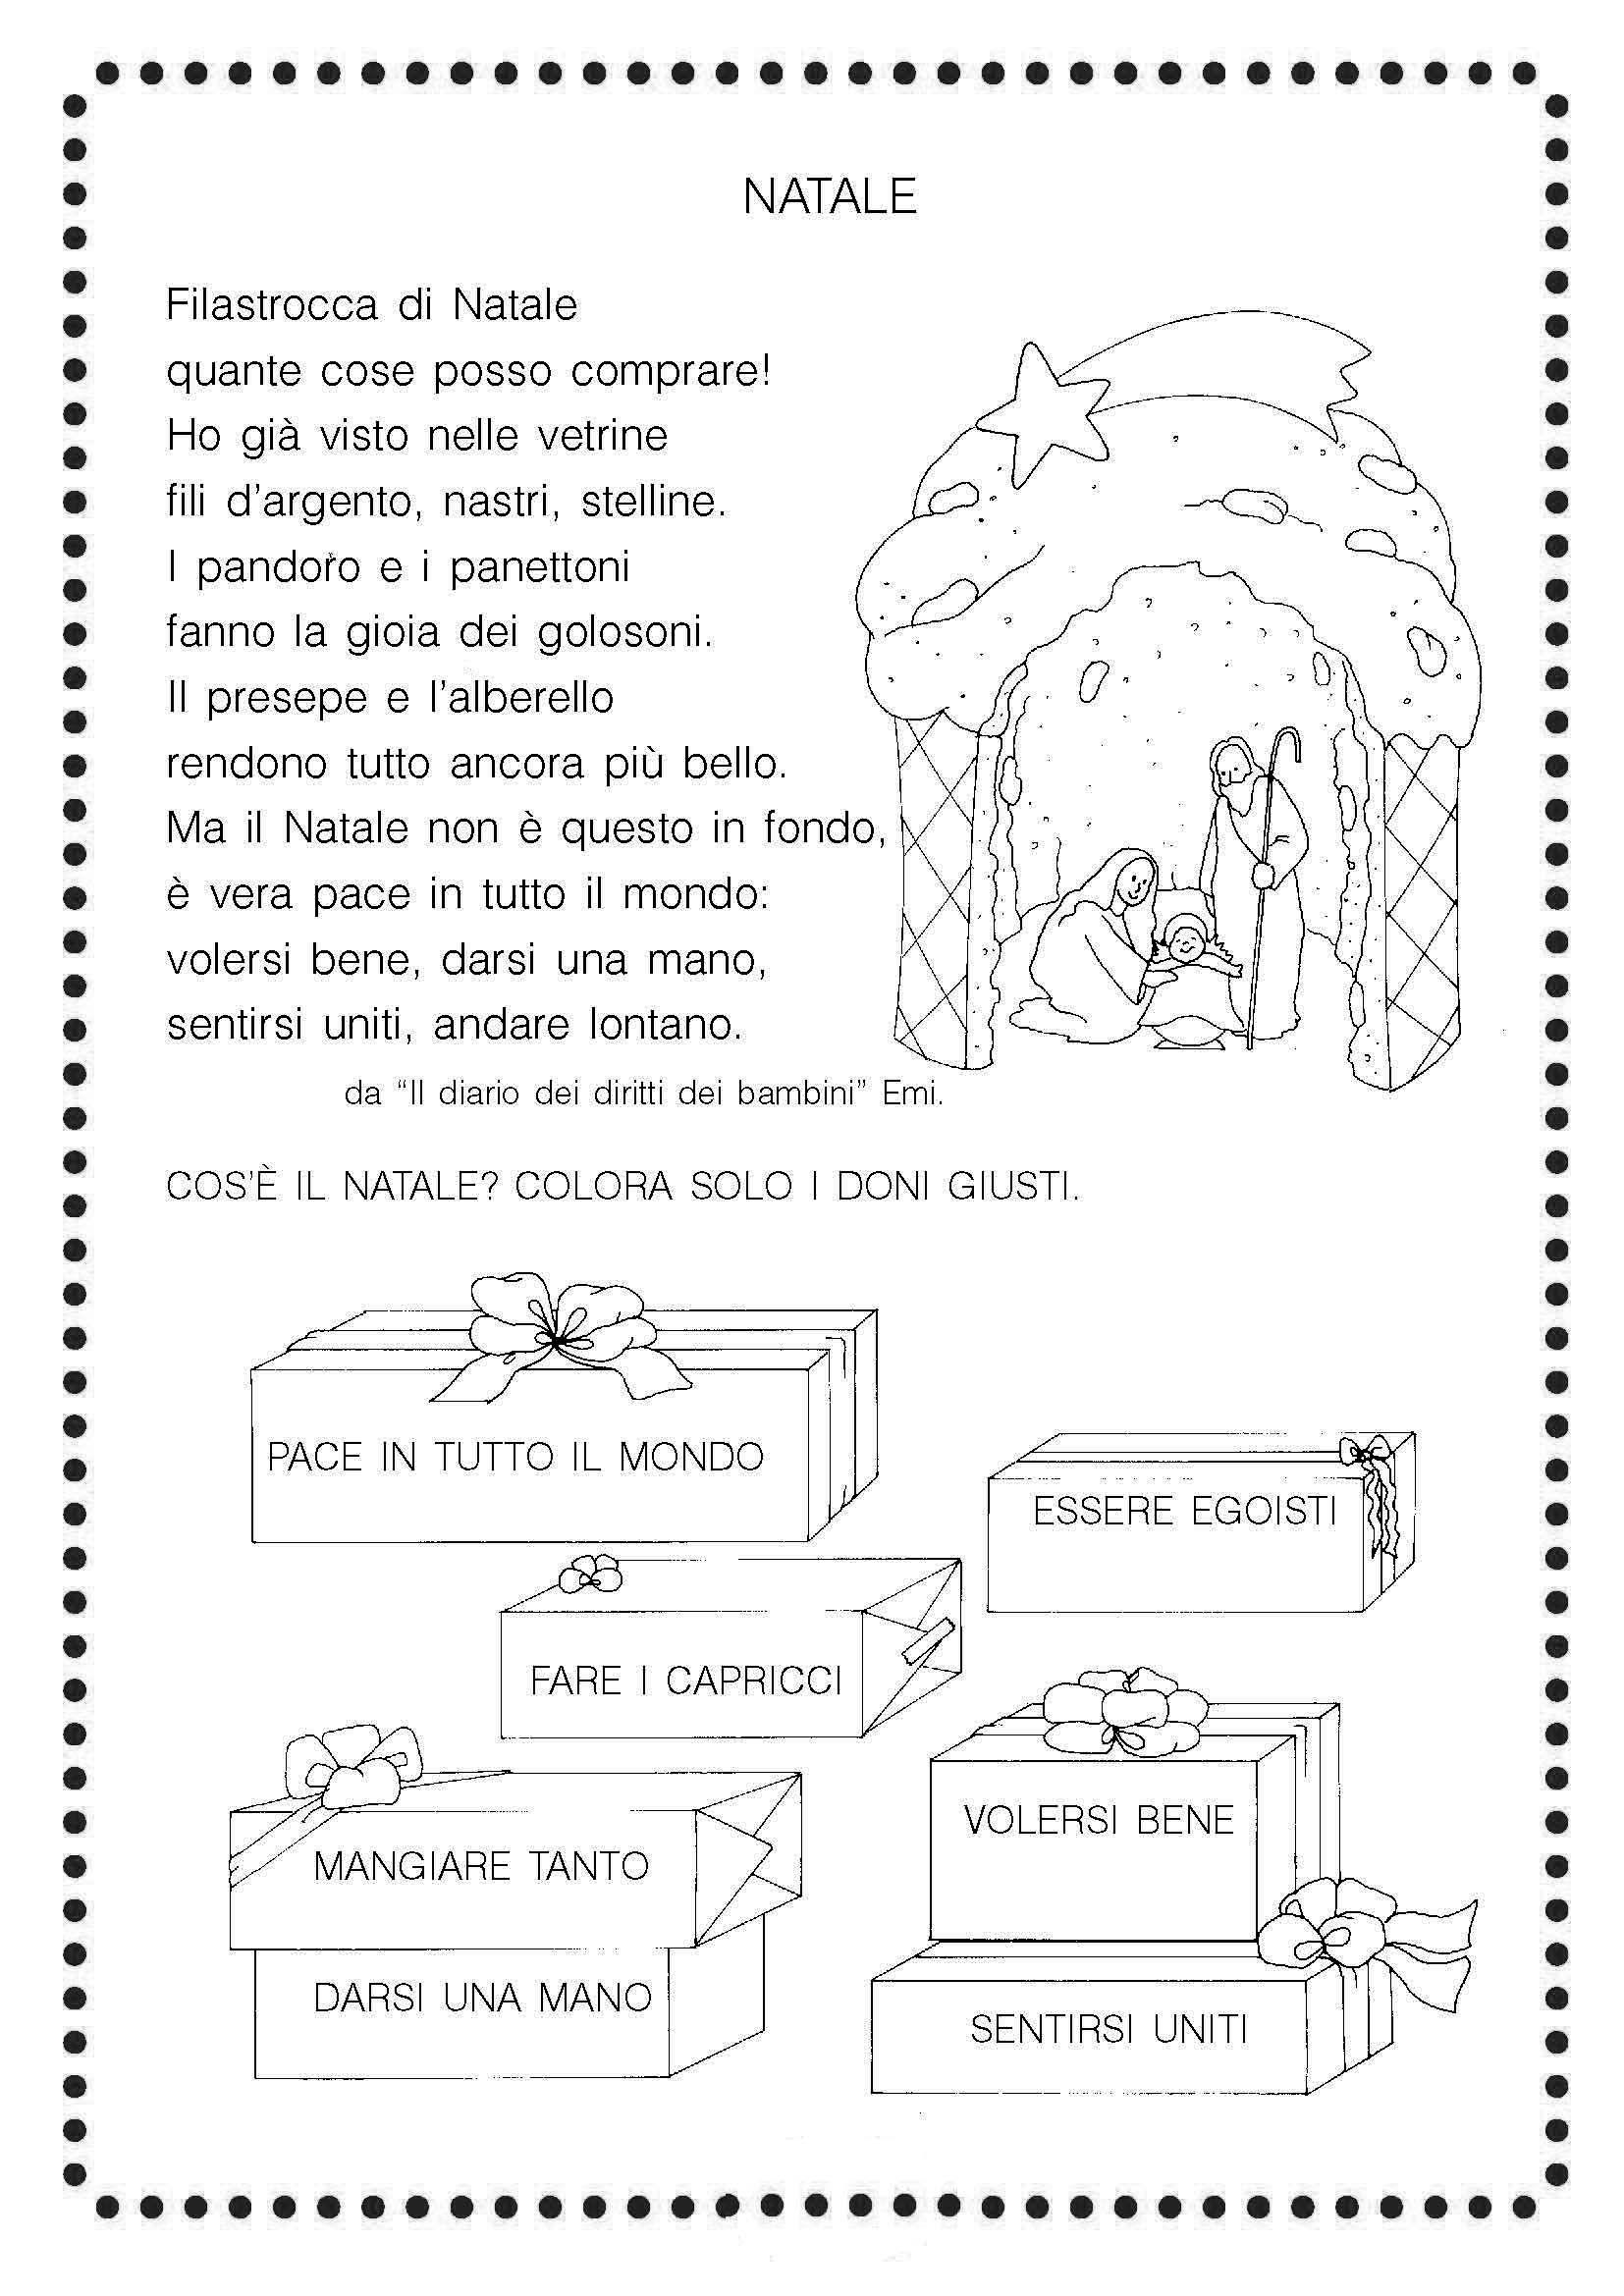 Filastrocca Natale Istruzione Christmas Illustration Christmas